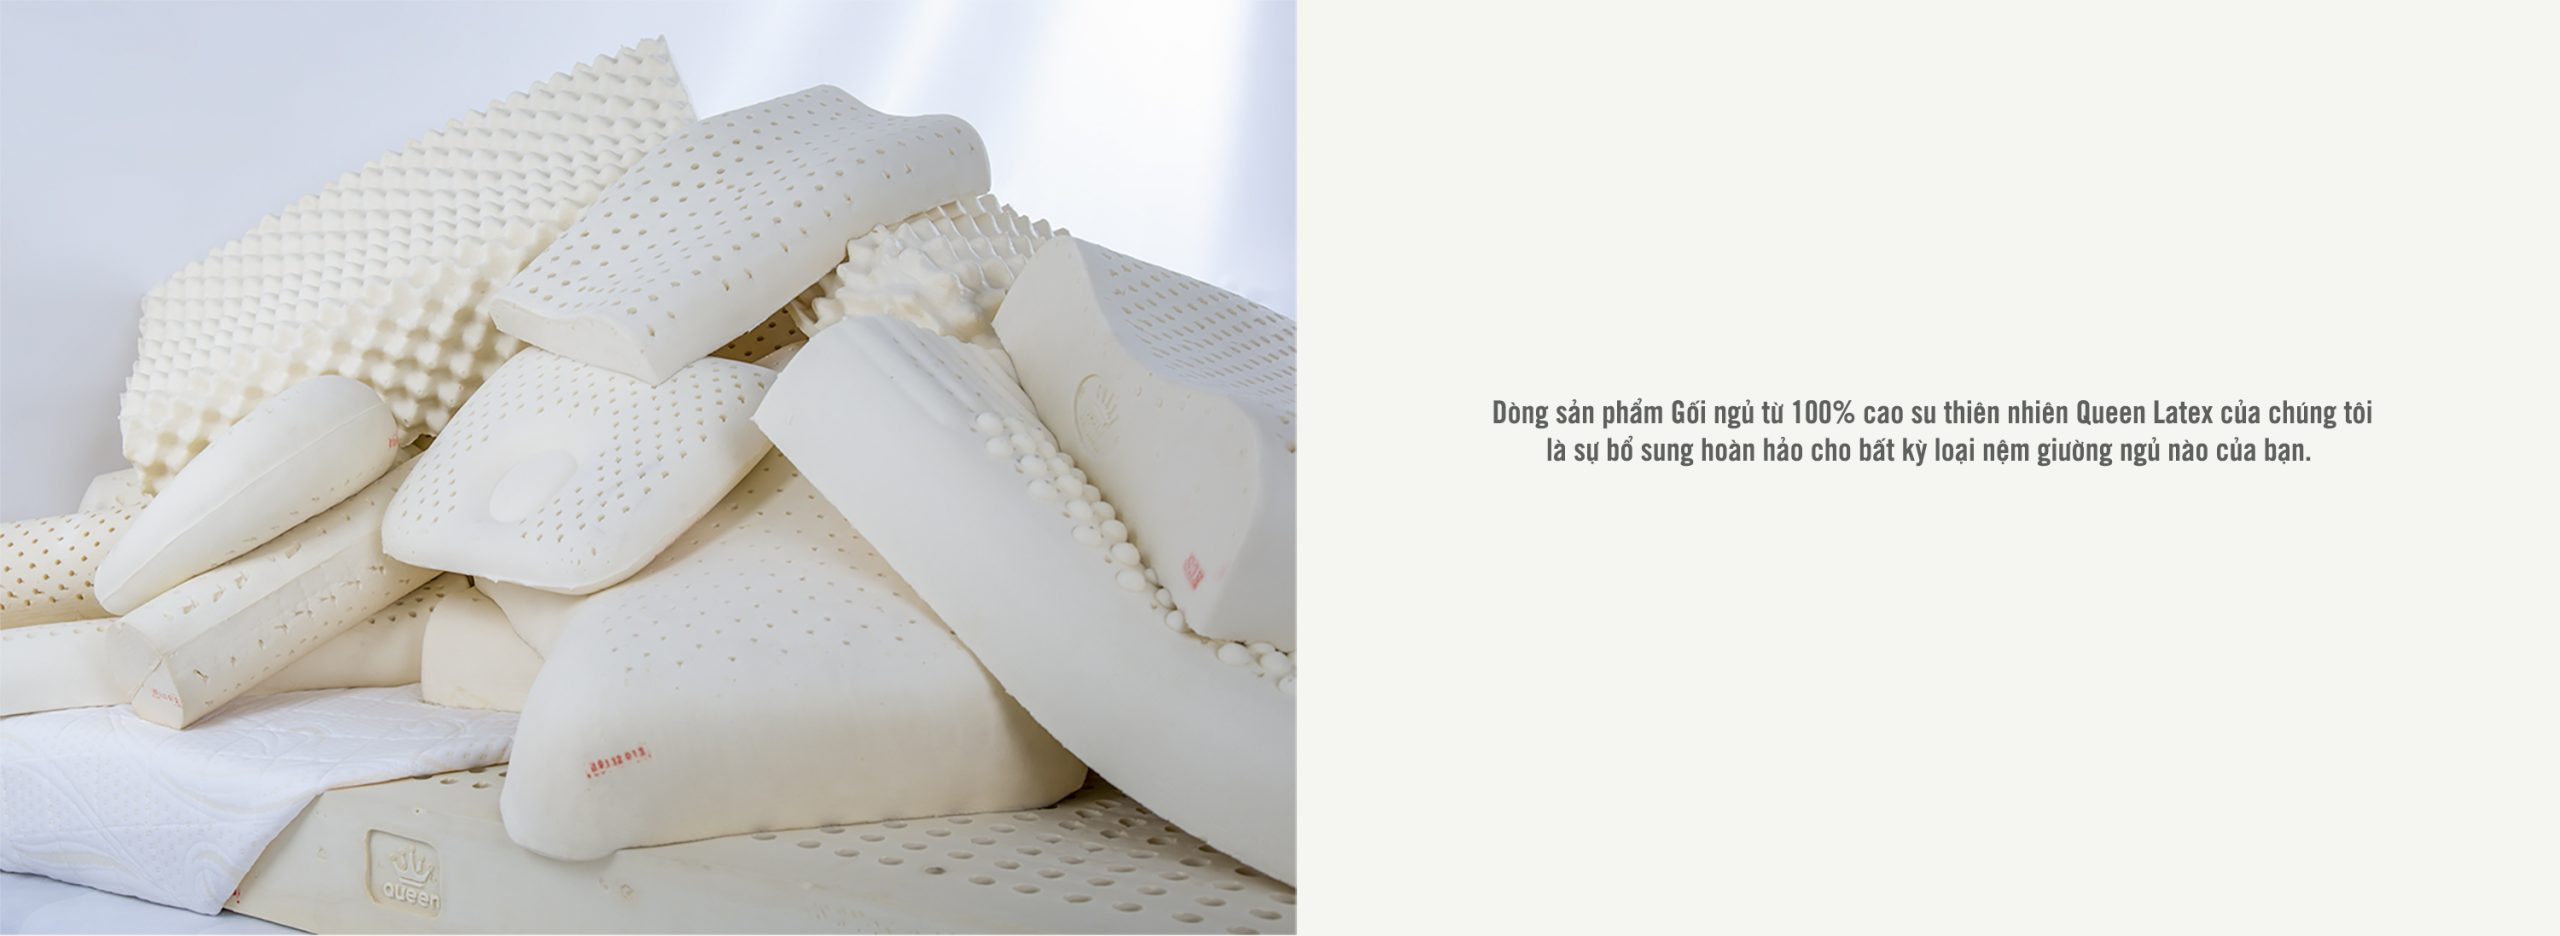 Gối cao su massage G/G2 - Vạn Thành goi cao su thien nhien 6 scaled